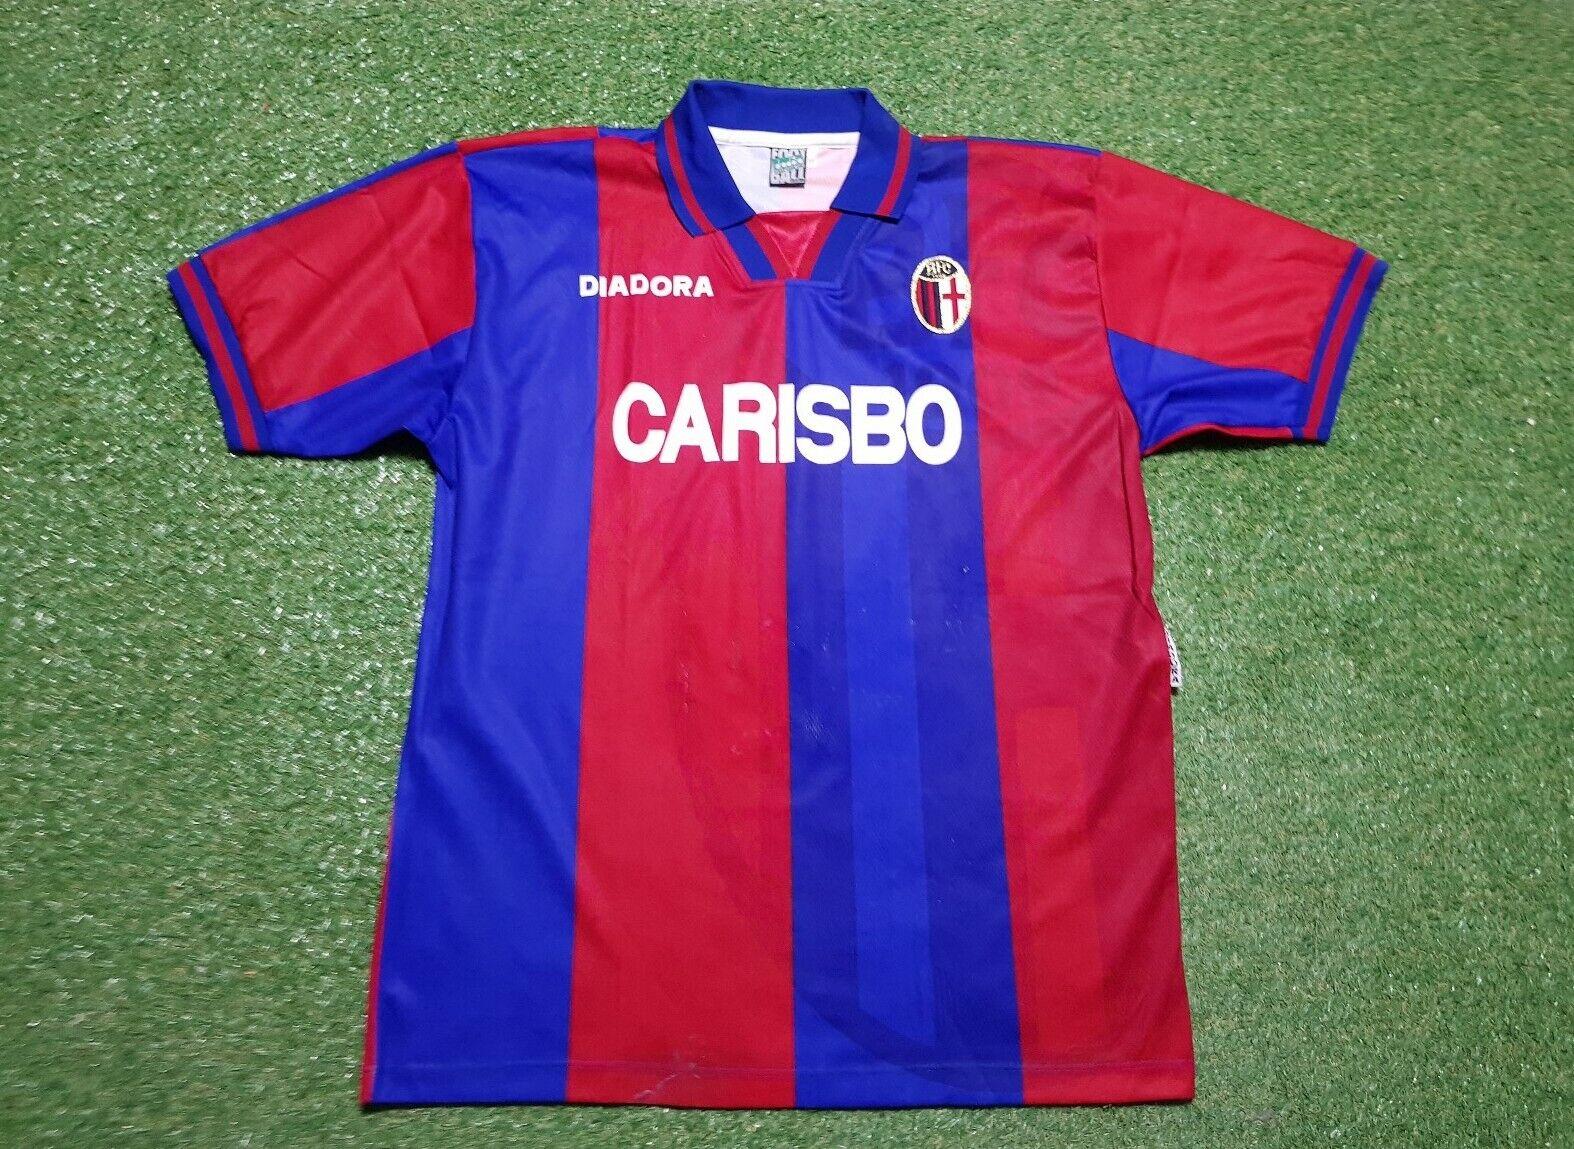 FC Bologna Maglia XXL 1996 1996 1996 1997 Diadora Calcio Shirt 9697 Jersey autoisbo c53